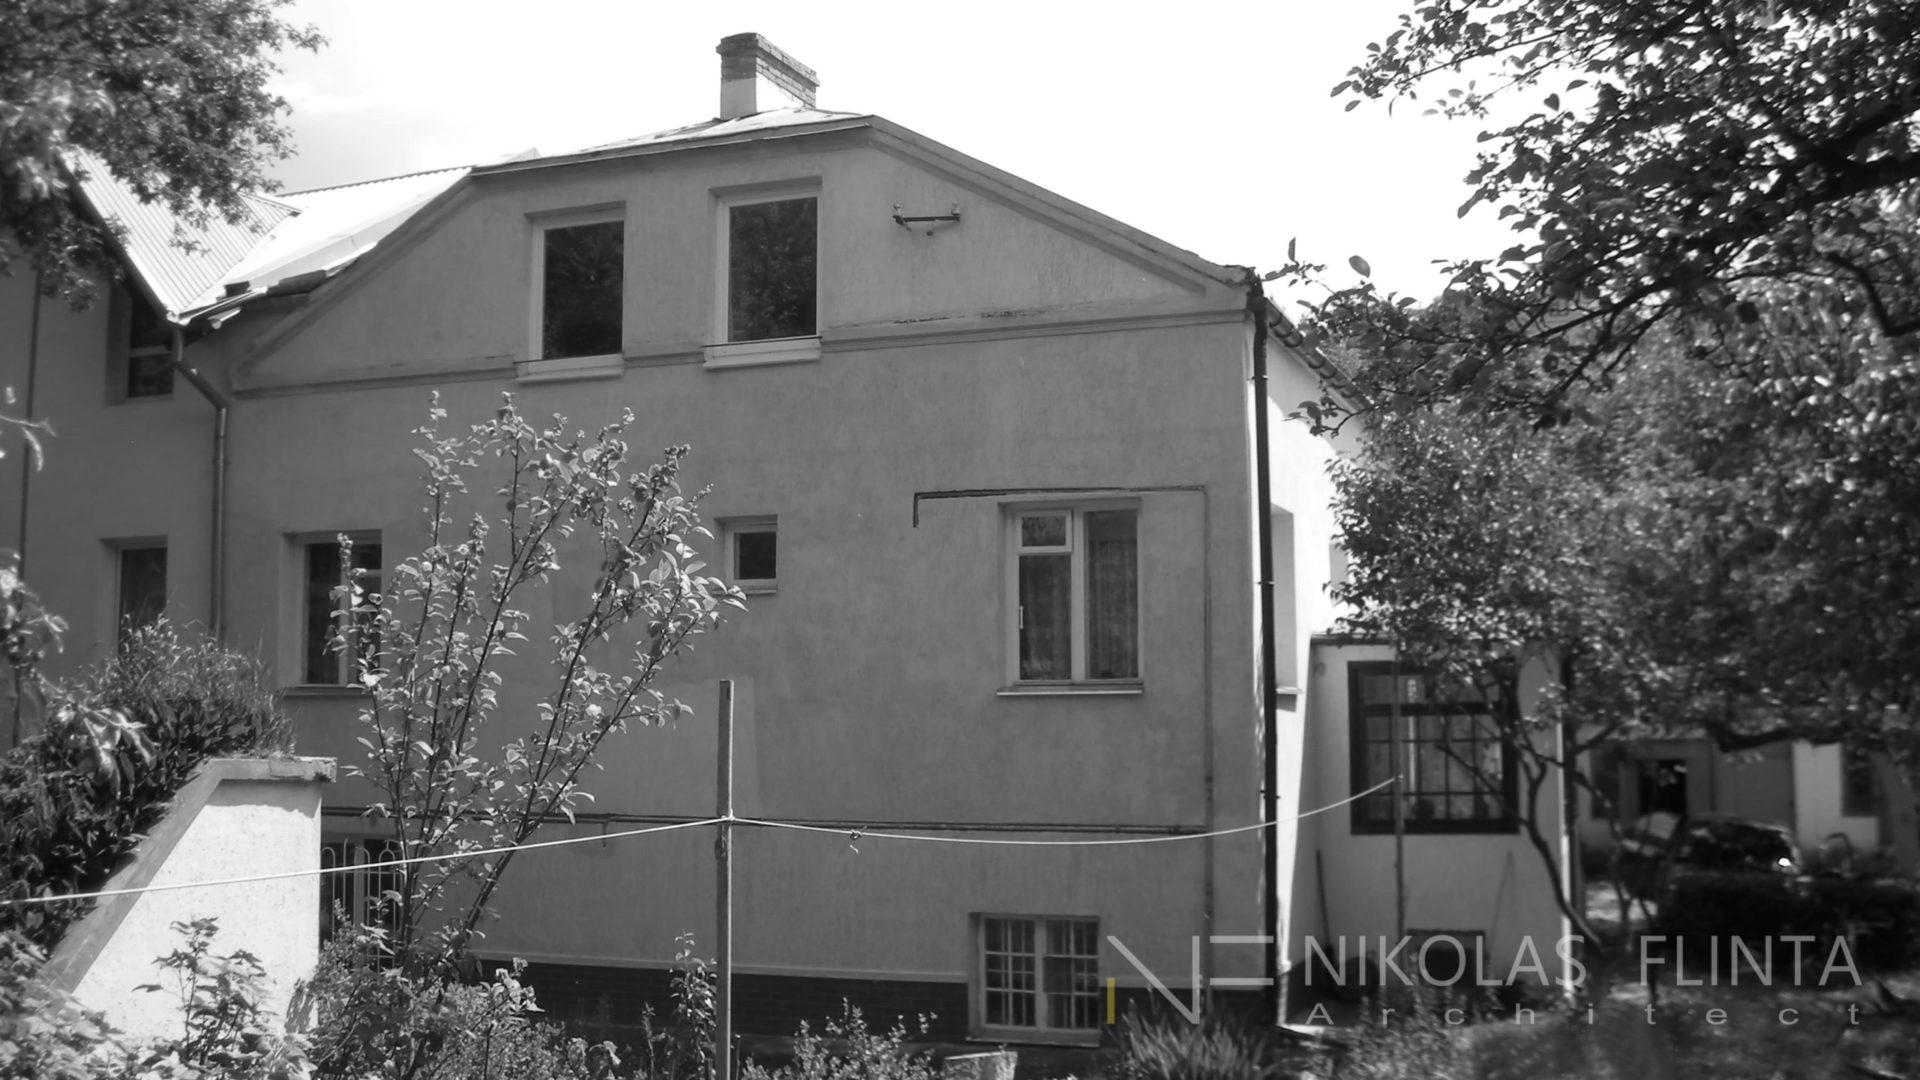 House-06PE_04-scaled.jpg